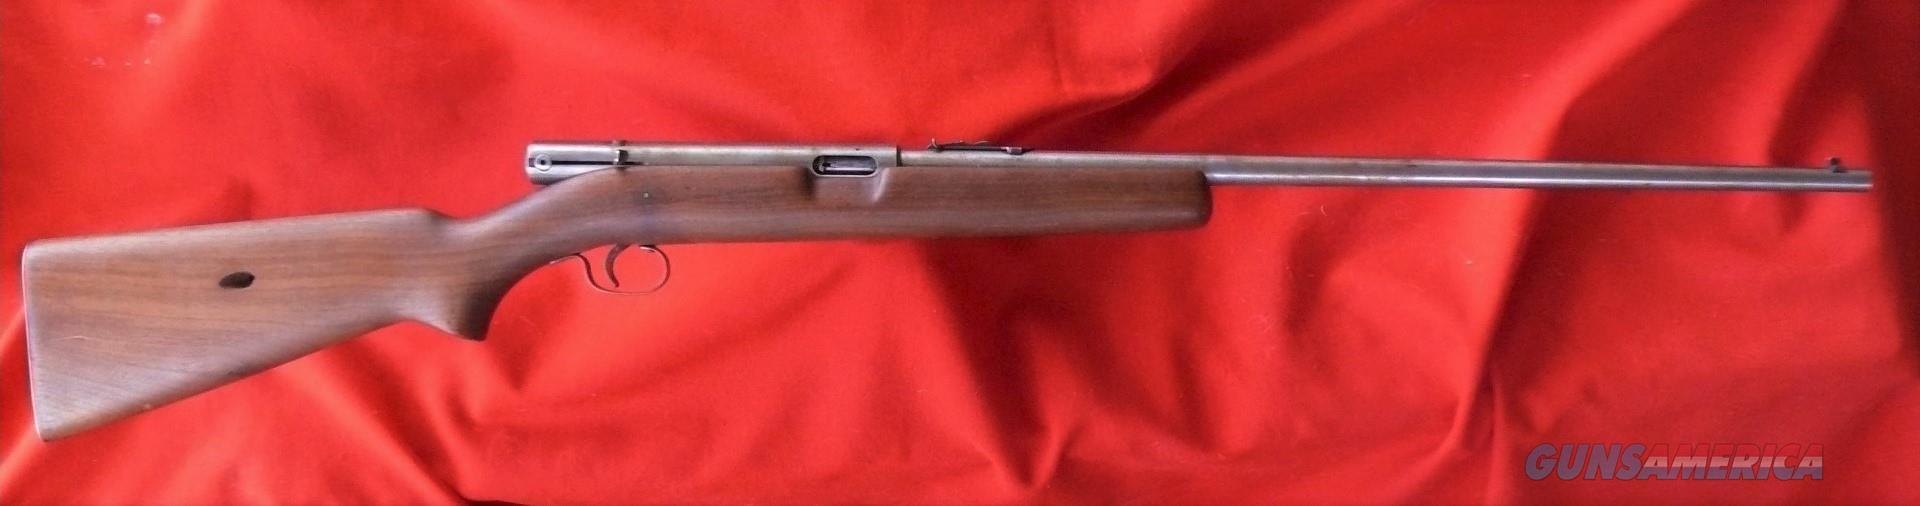 Rare Winchester Model 74 .22 SHORT 1940 Early Production   Guns > Rifles > Winchester Rifles - Modern Bolt/Auto/Single > Autoloaders